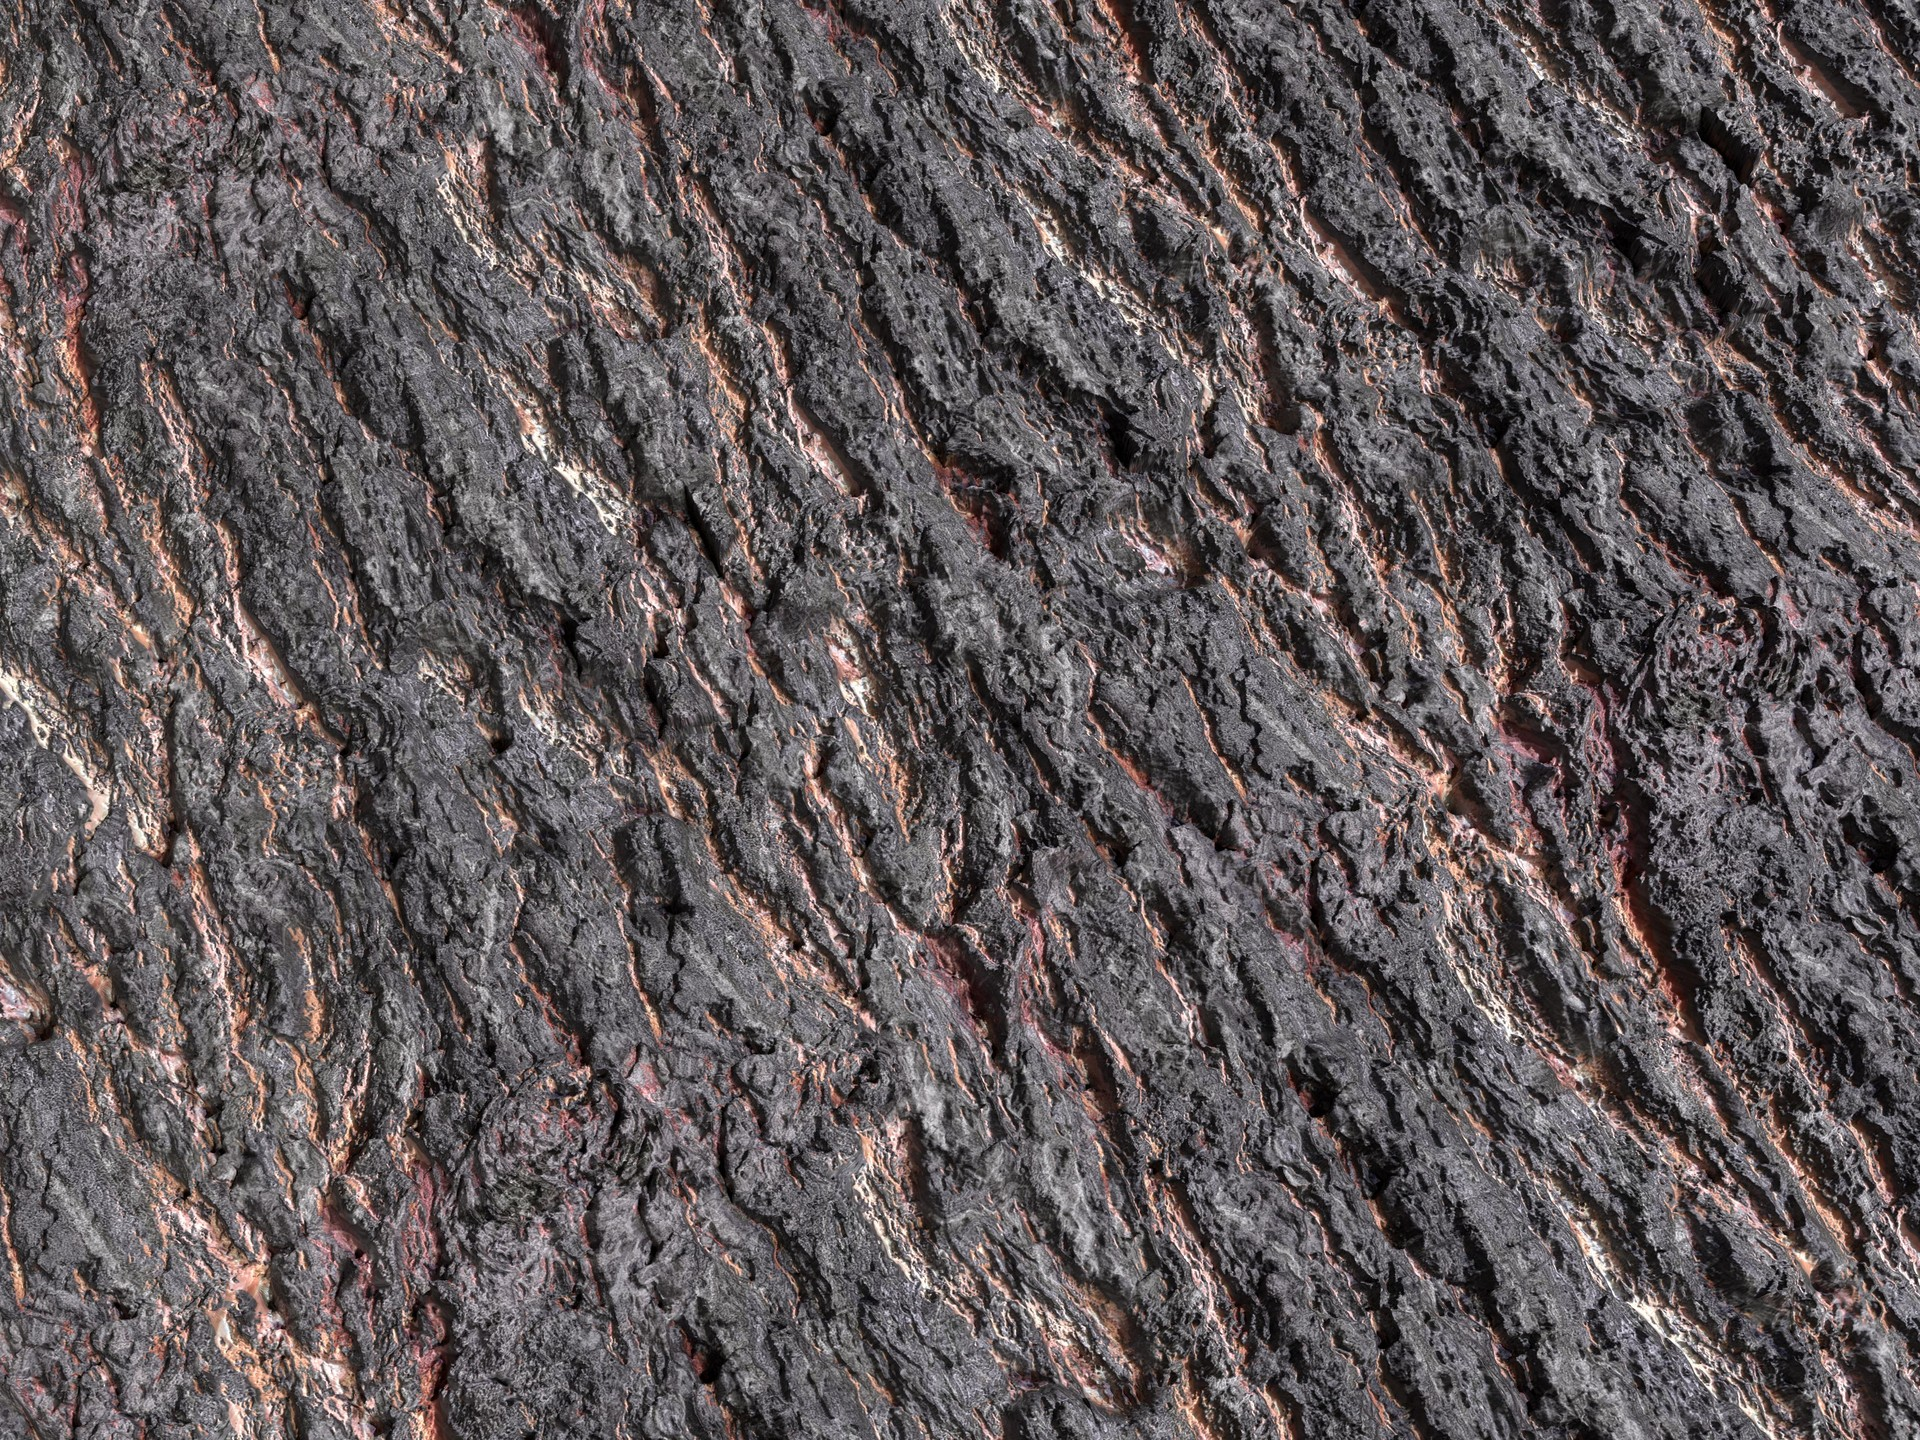 Martin pietras bark scan 03